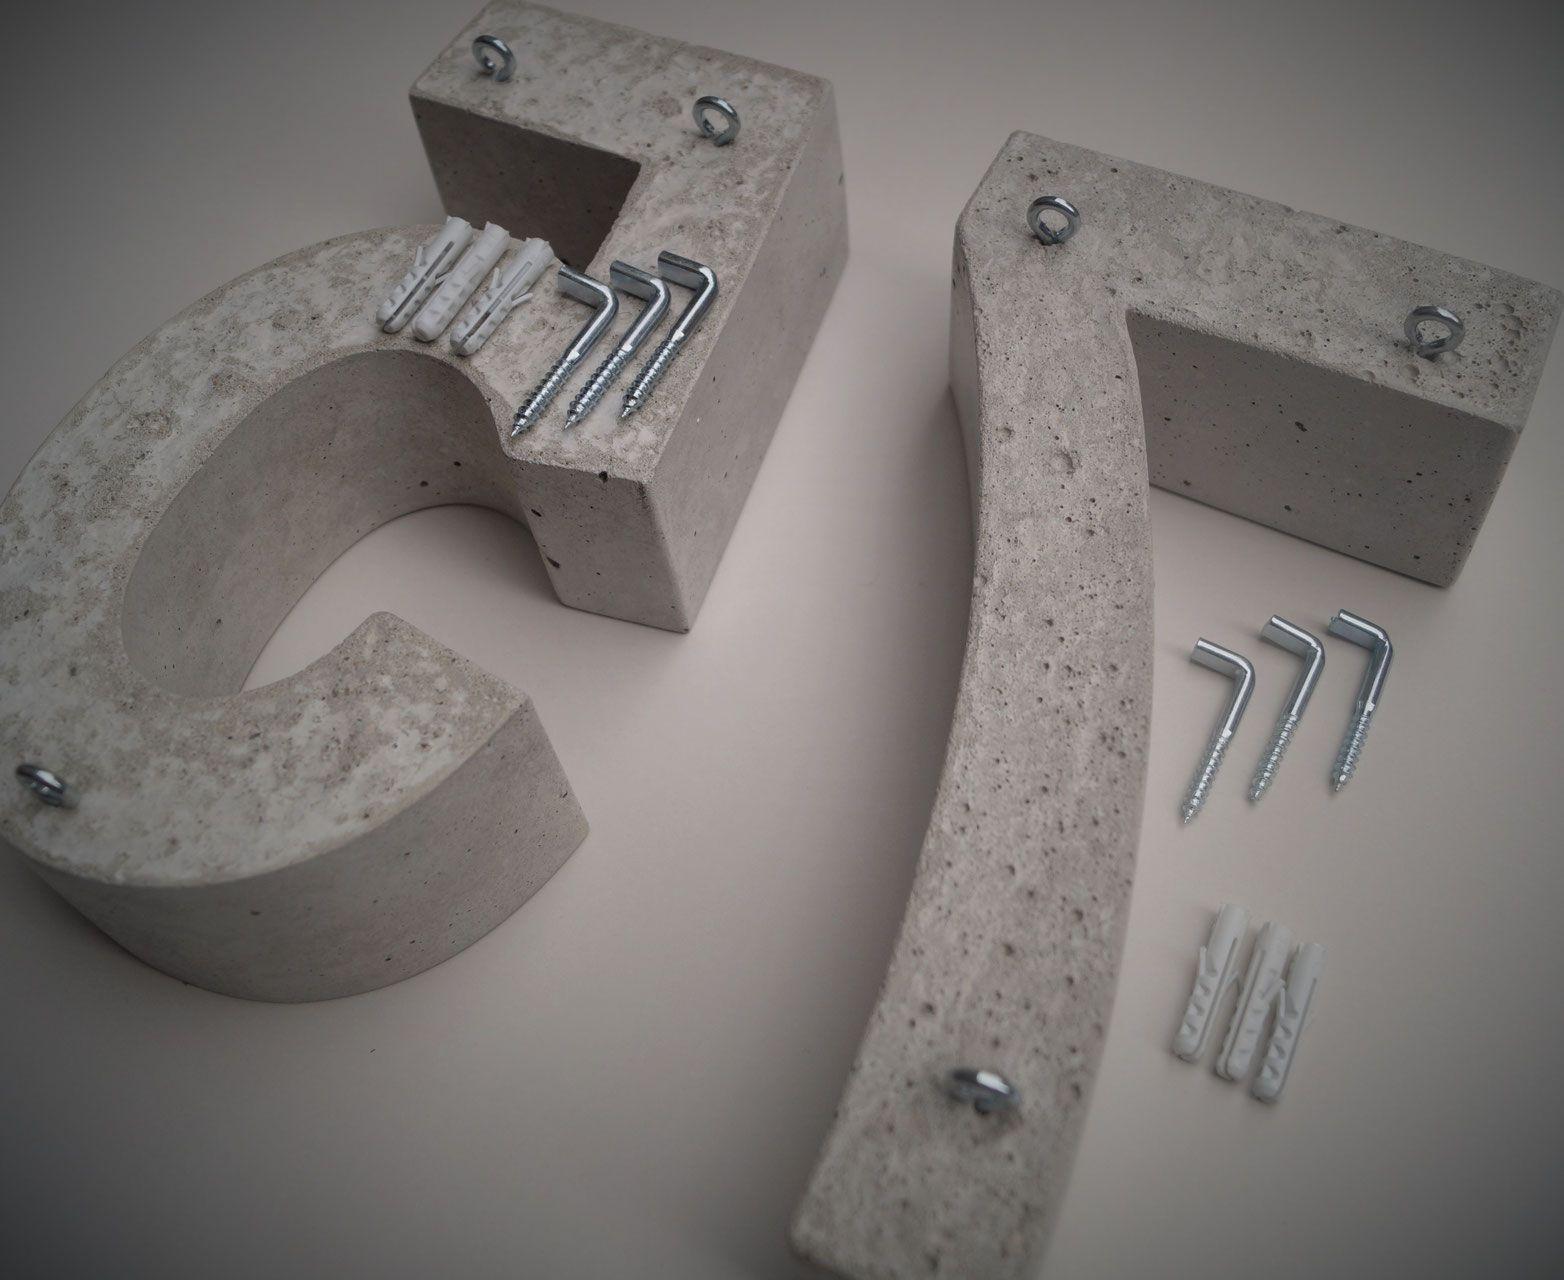 Hausnummer arial narrow bold 24 cm h he haus for Beton haus bauen